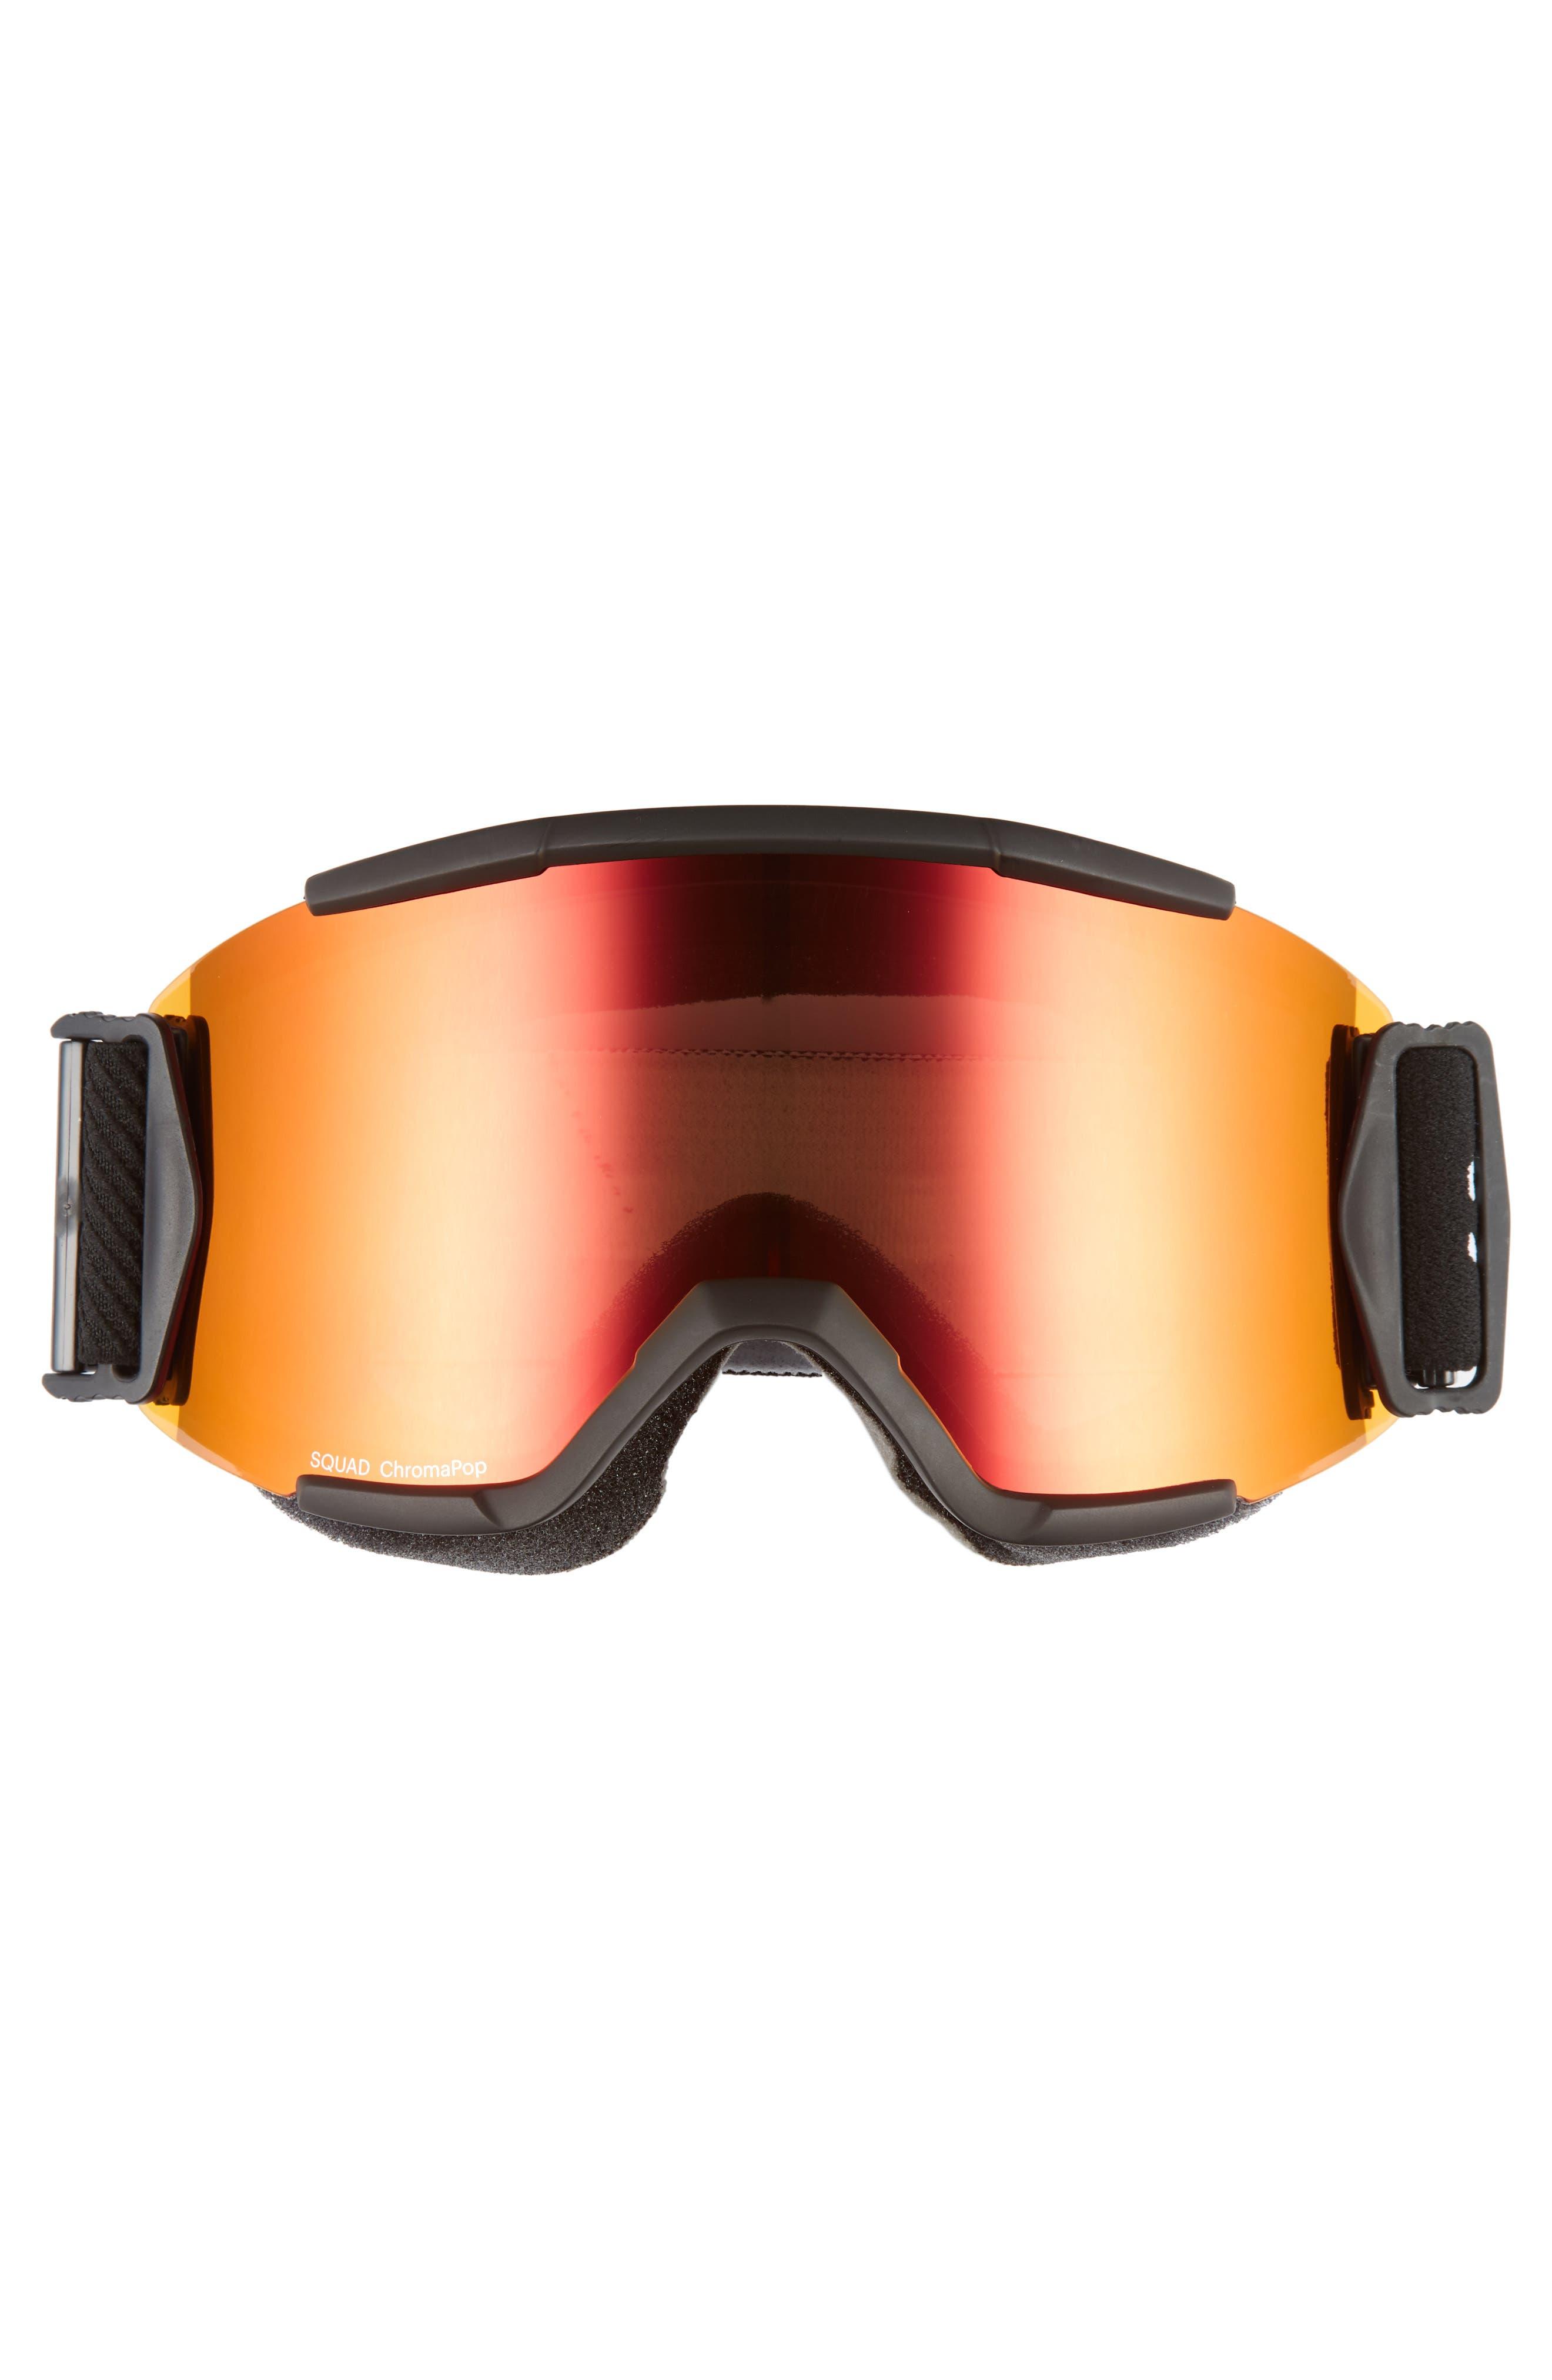 Squad Chromapop 165mm Snow Goggles,                             Alternate thumbnail 2, color,                             BLACK